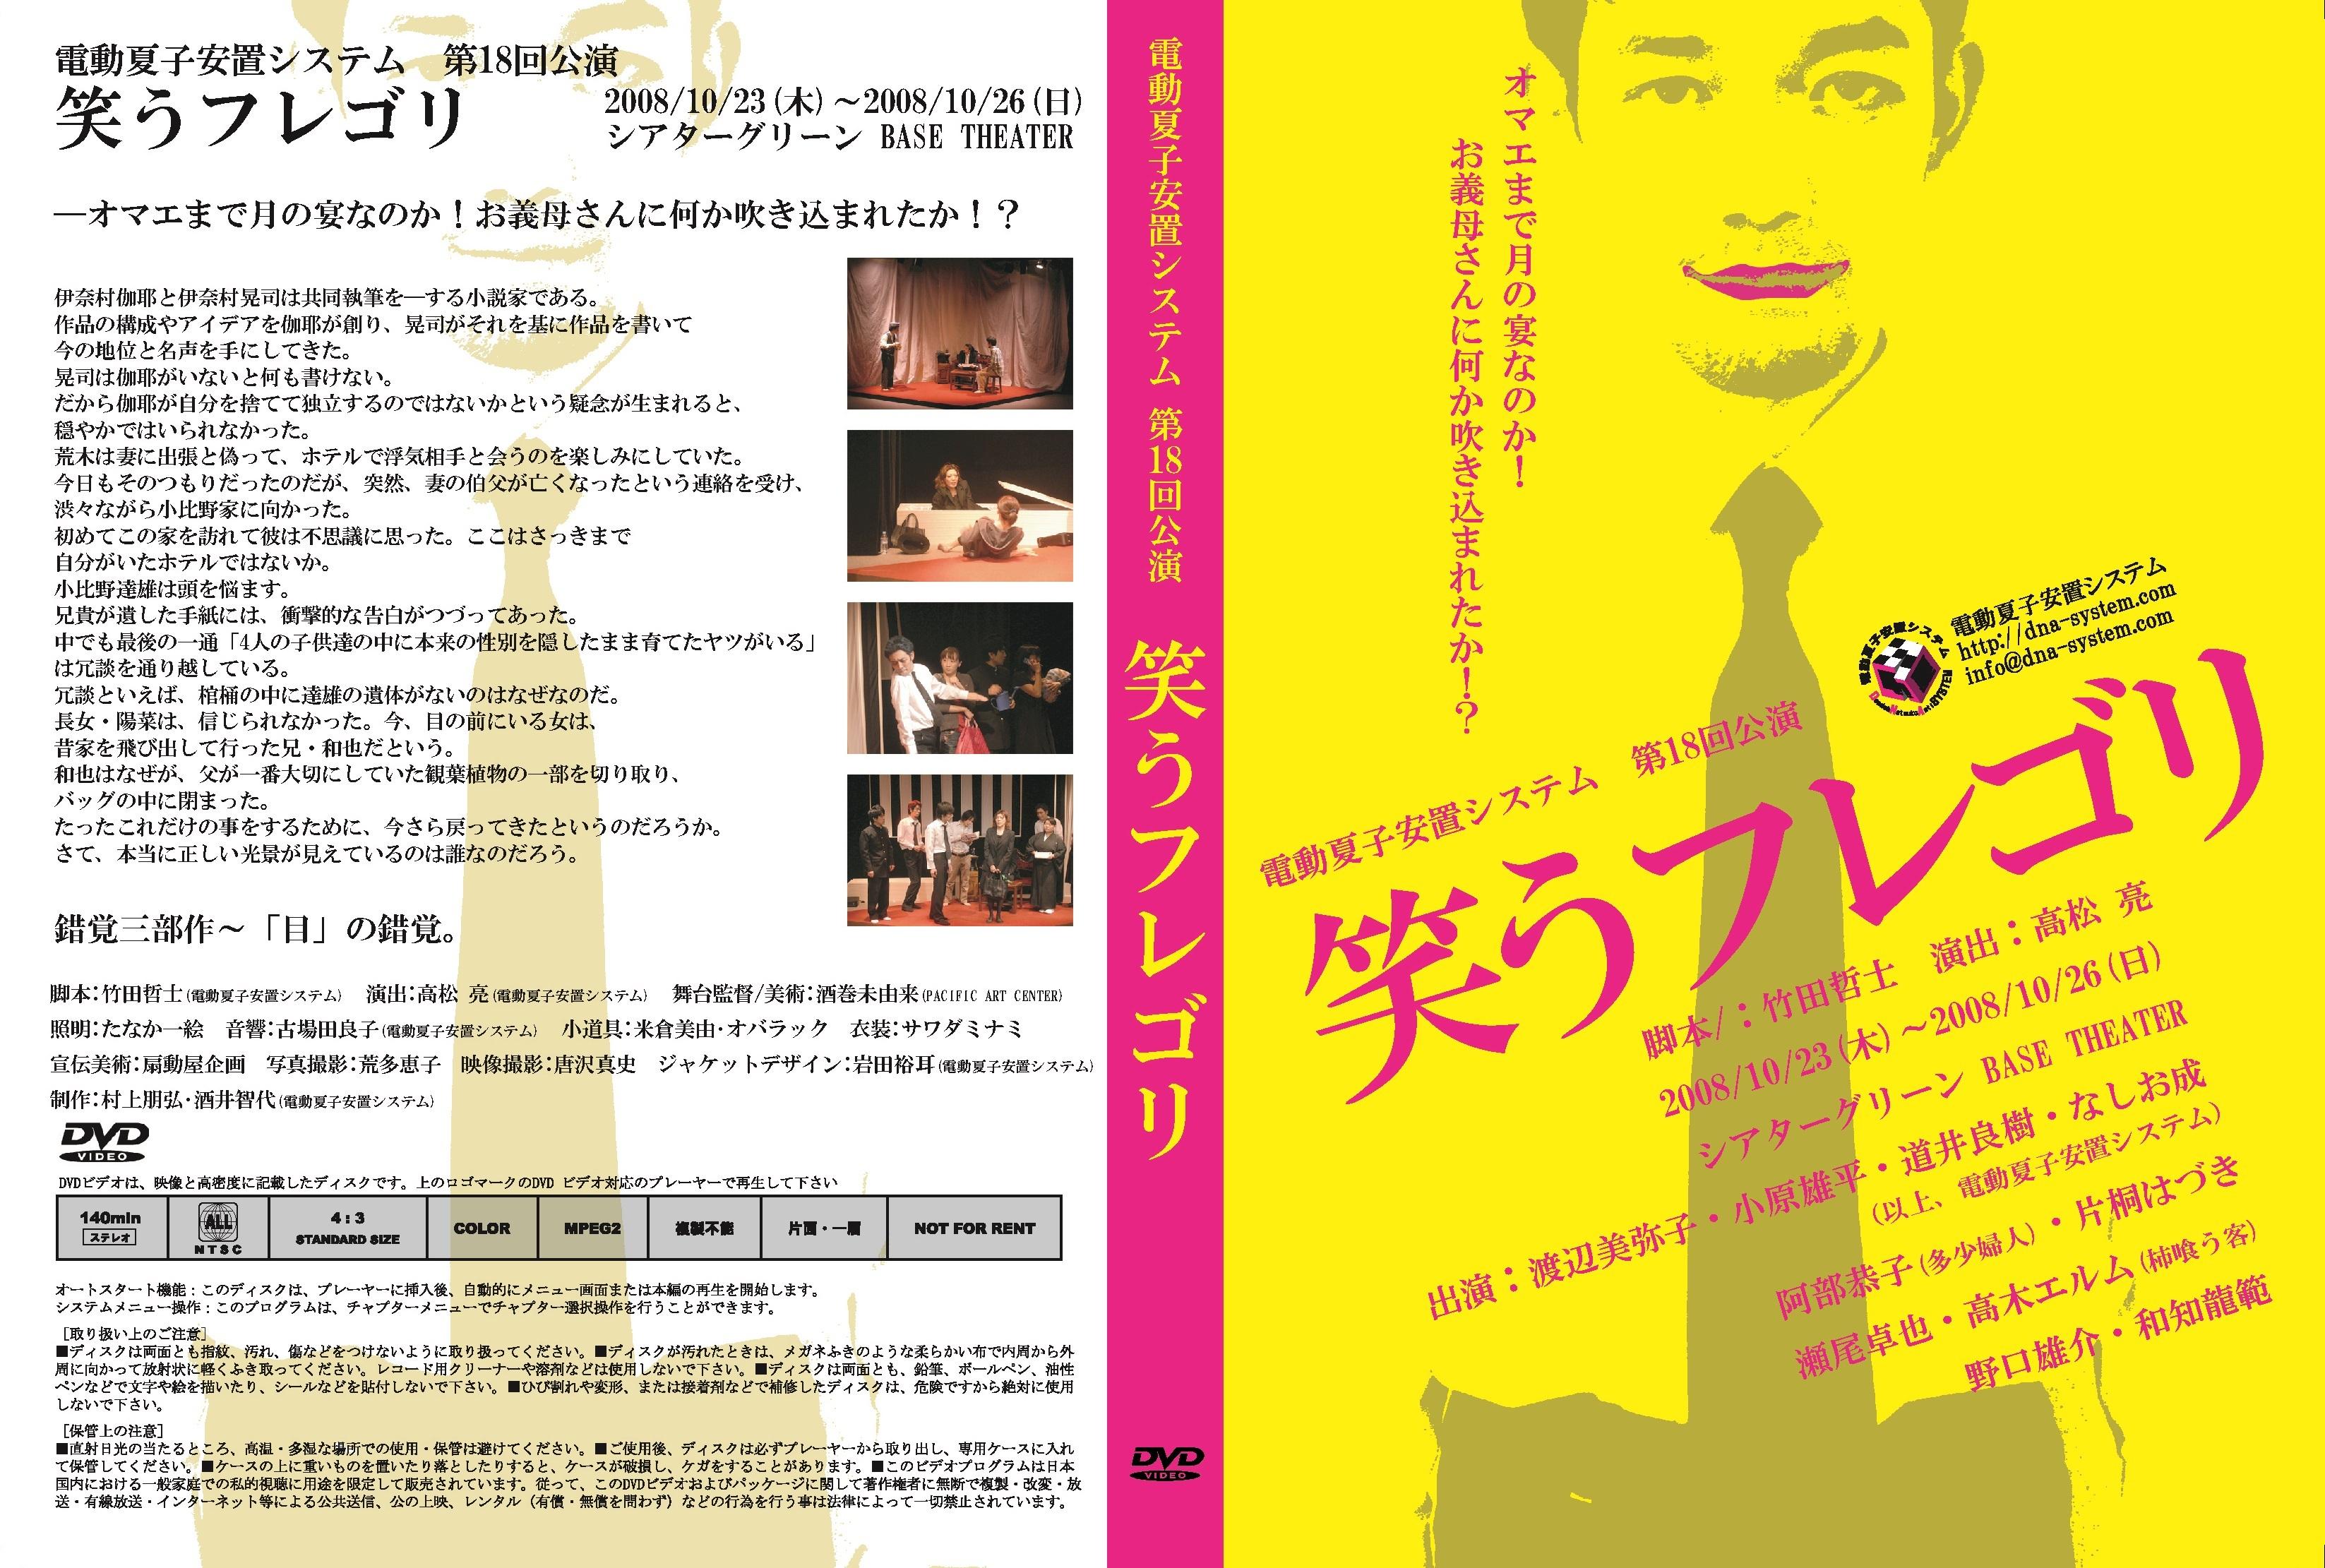 DVD 第18回公演『笑うフレゴリ』